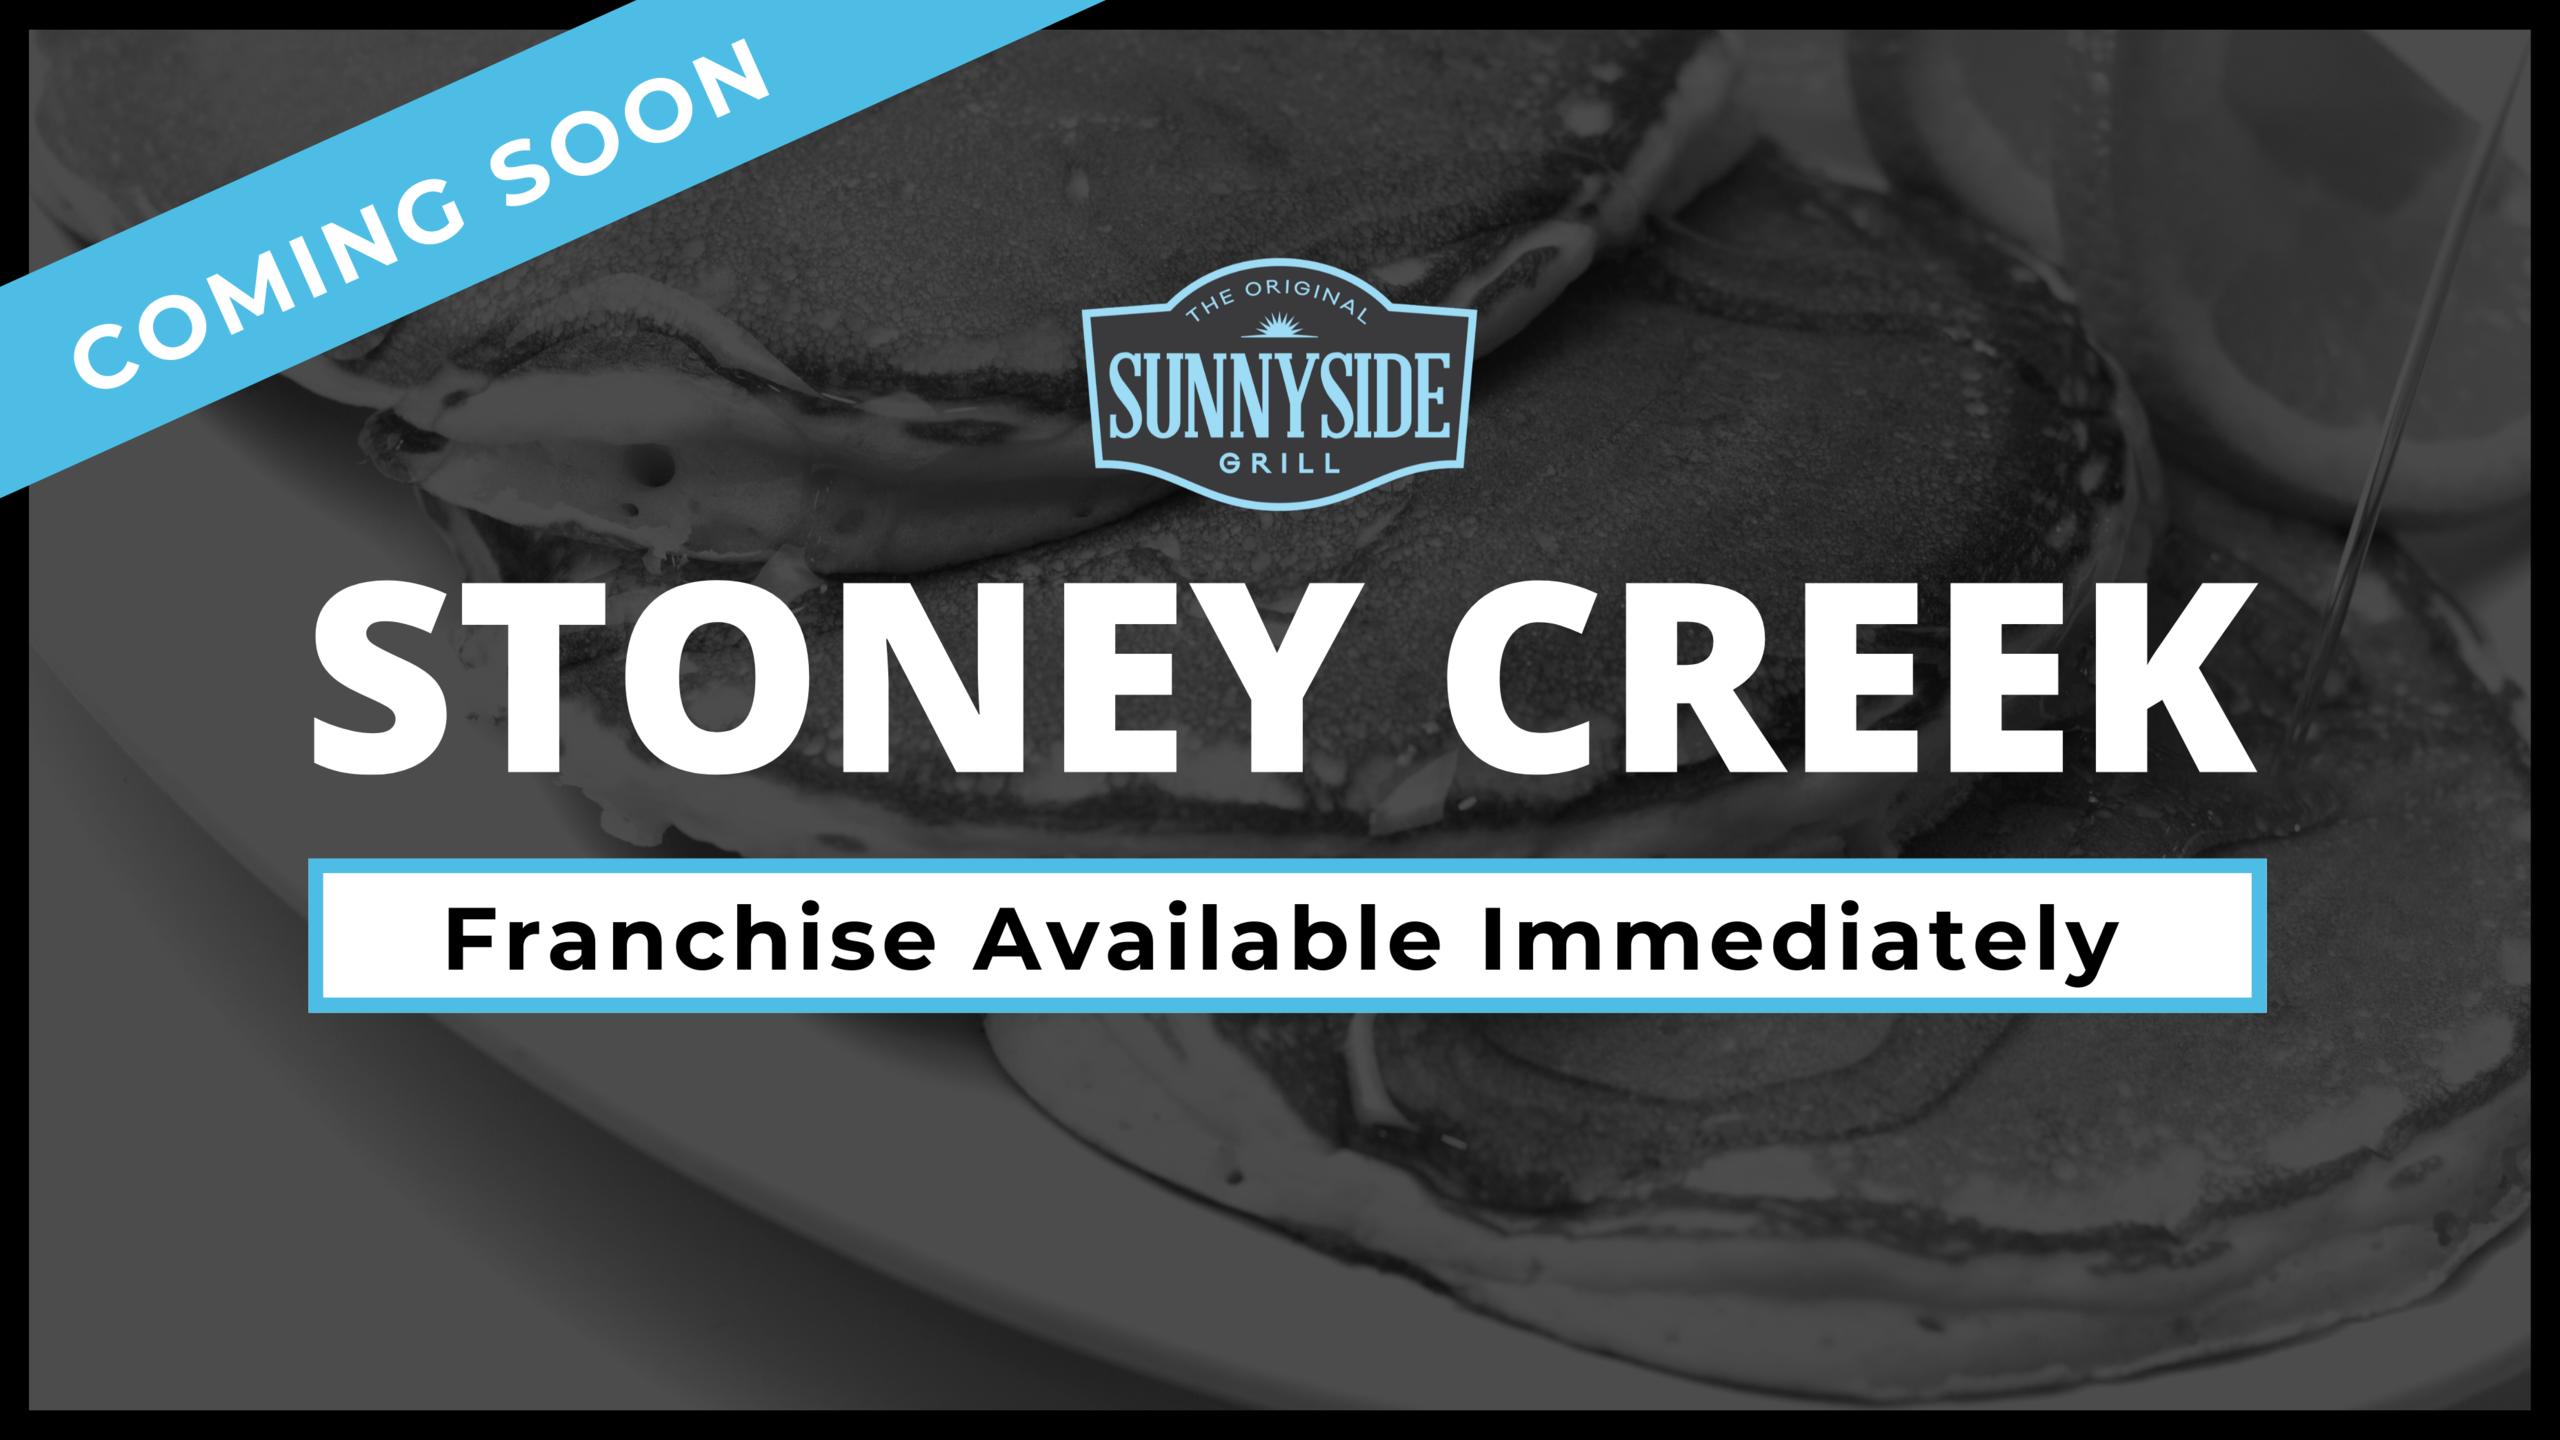 Stoney Creek Franchise Opportunity